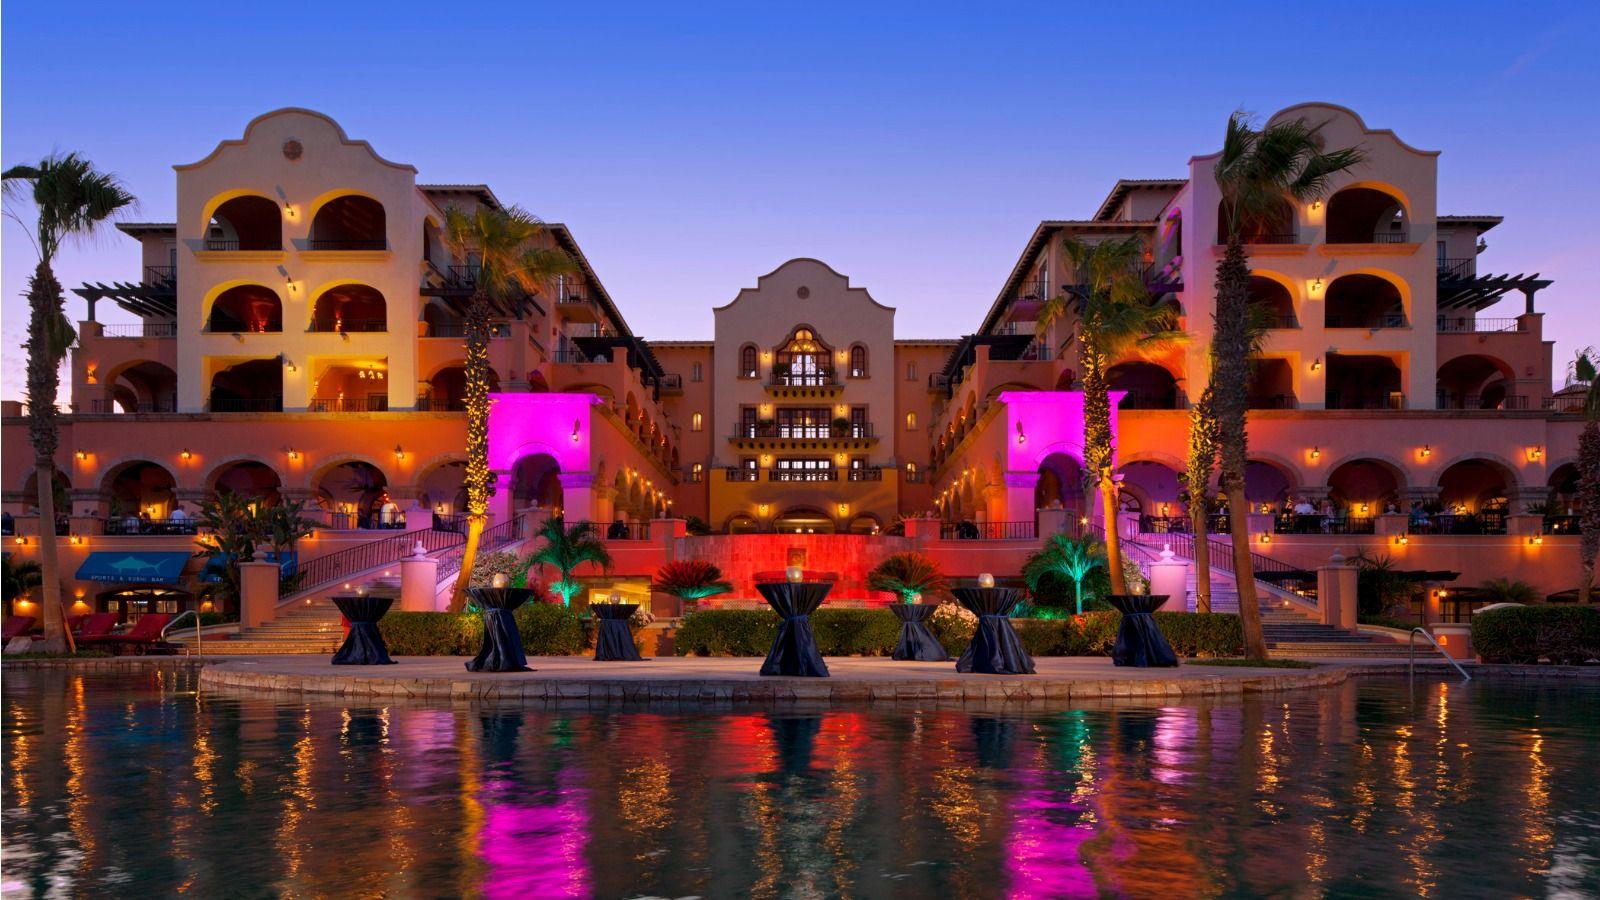 Evening and sunset at Sheraton Hacienda del Mar Golf & Spa Resort